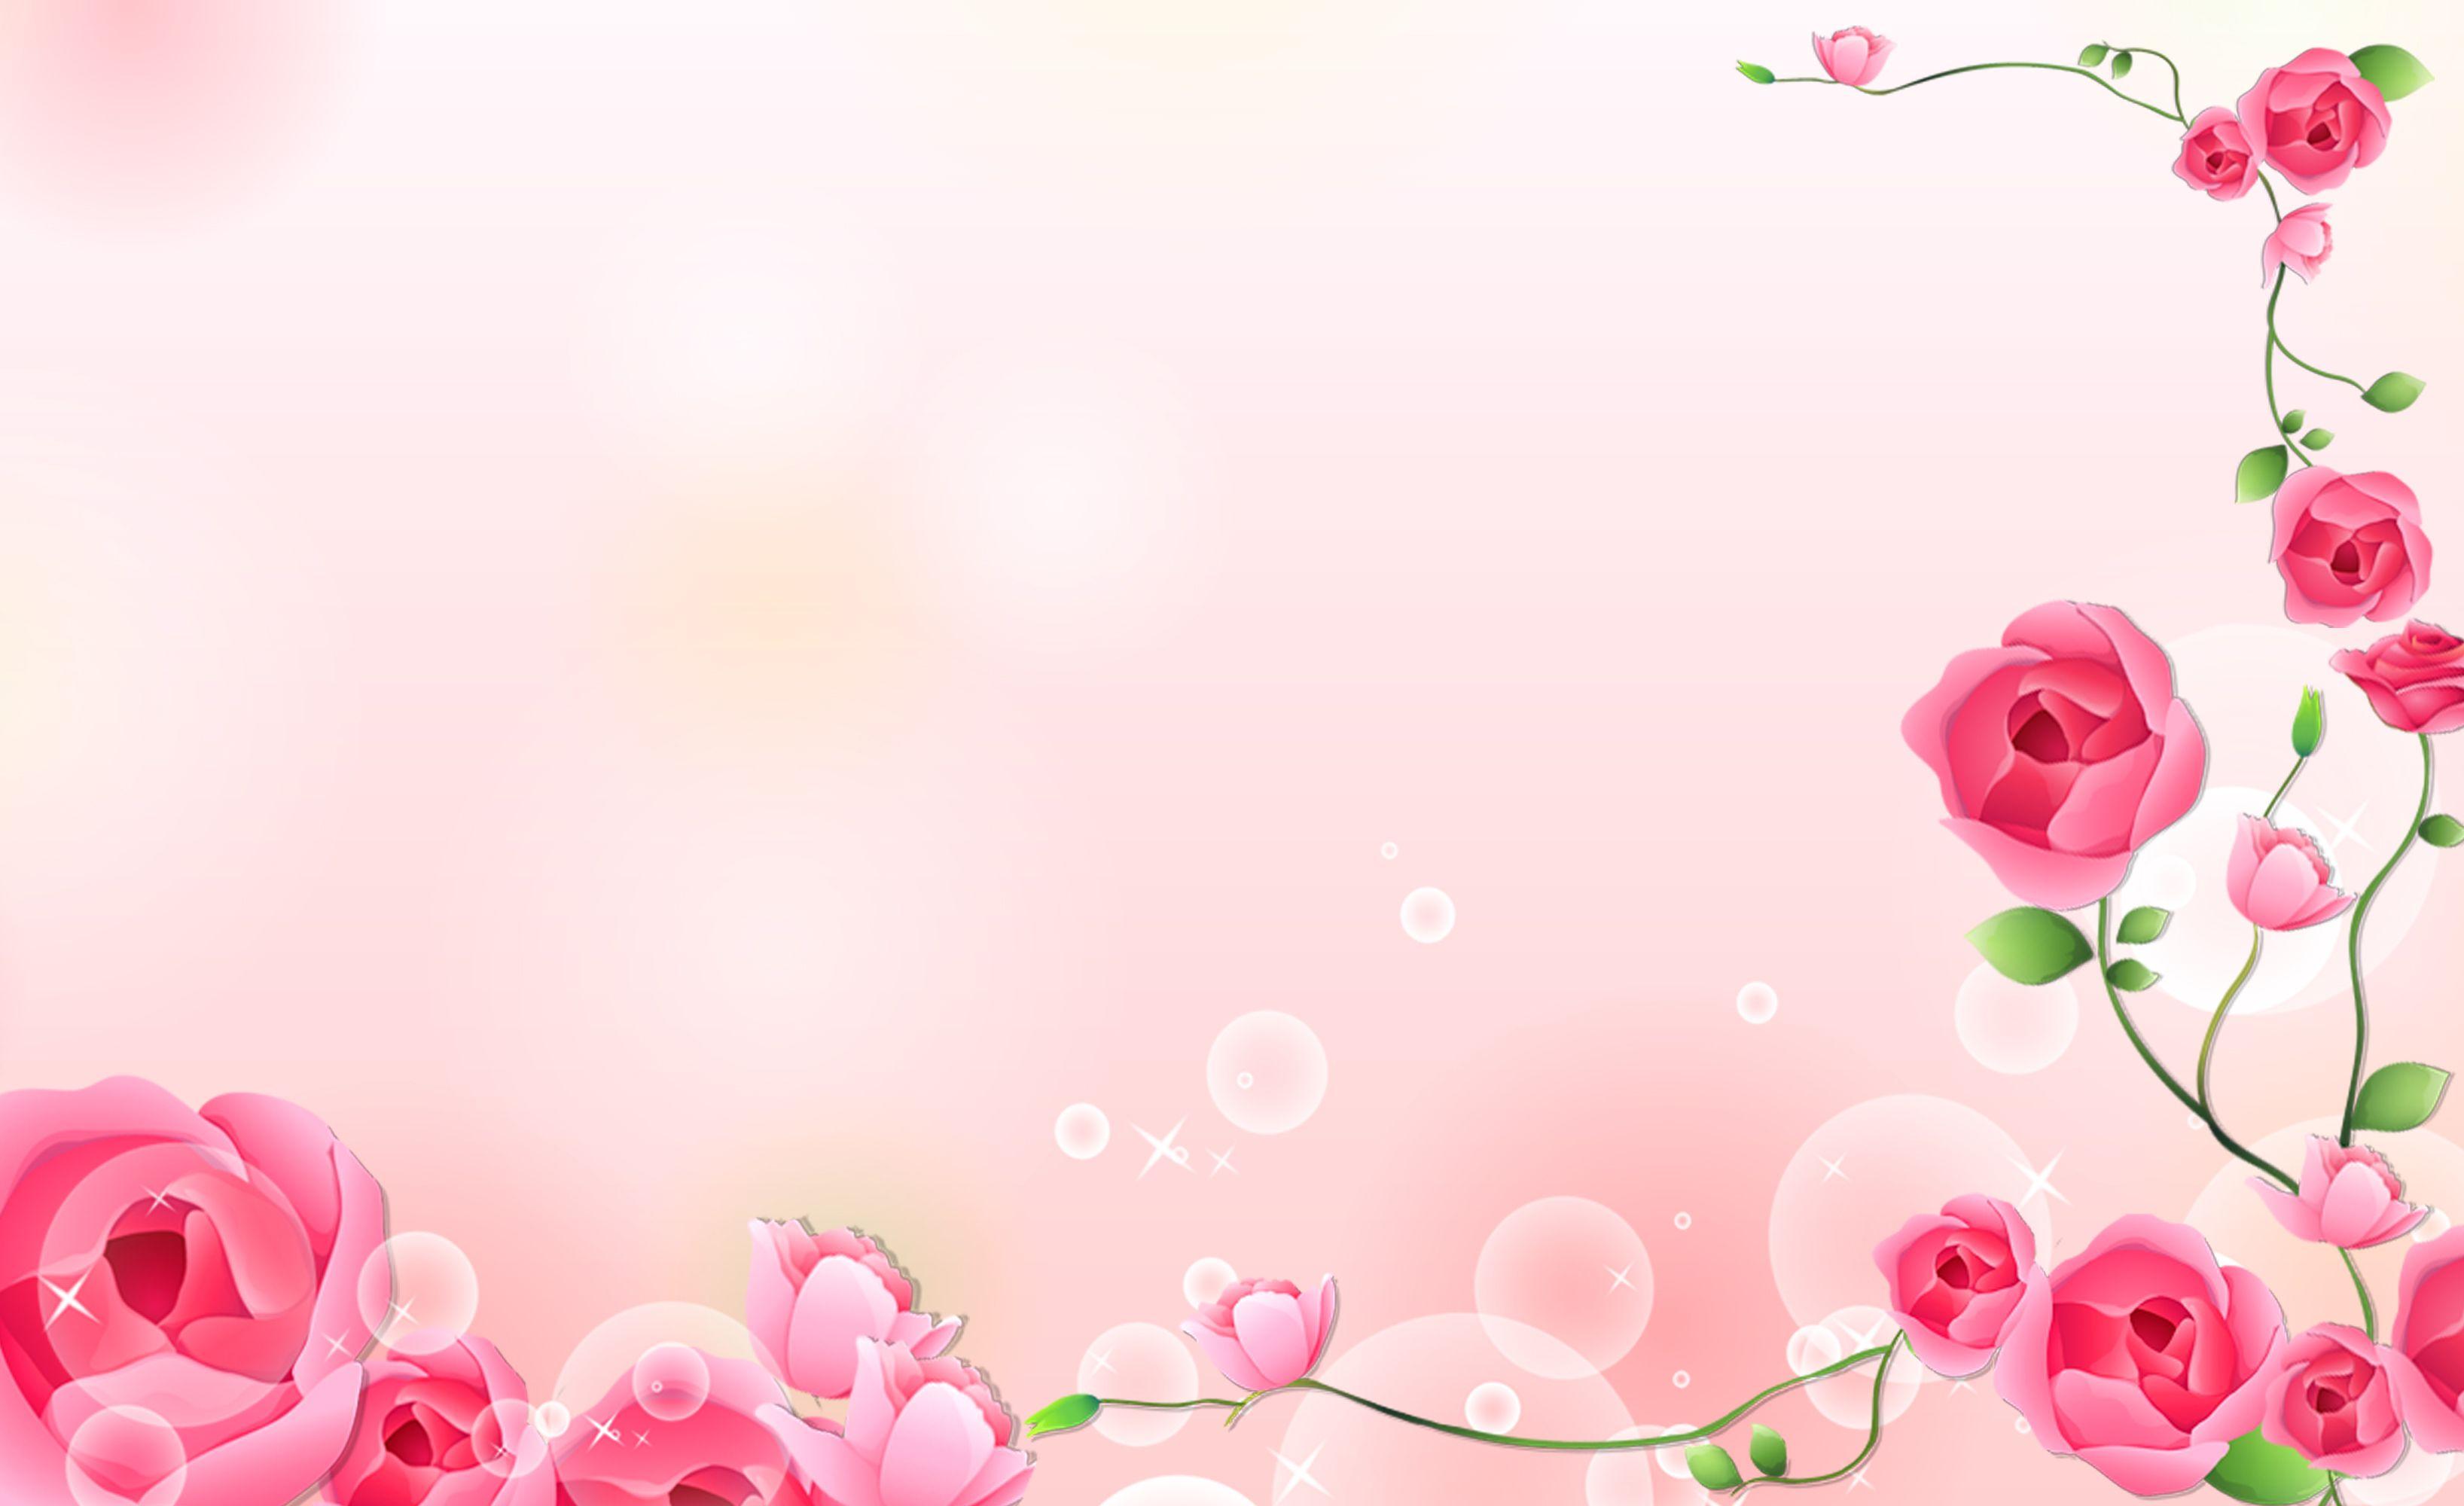 Roses Card Pink Flowers Background Em 2020 Cartoes De Visita